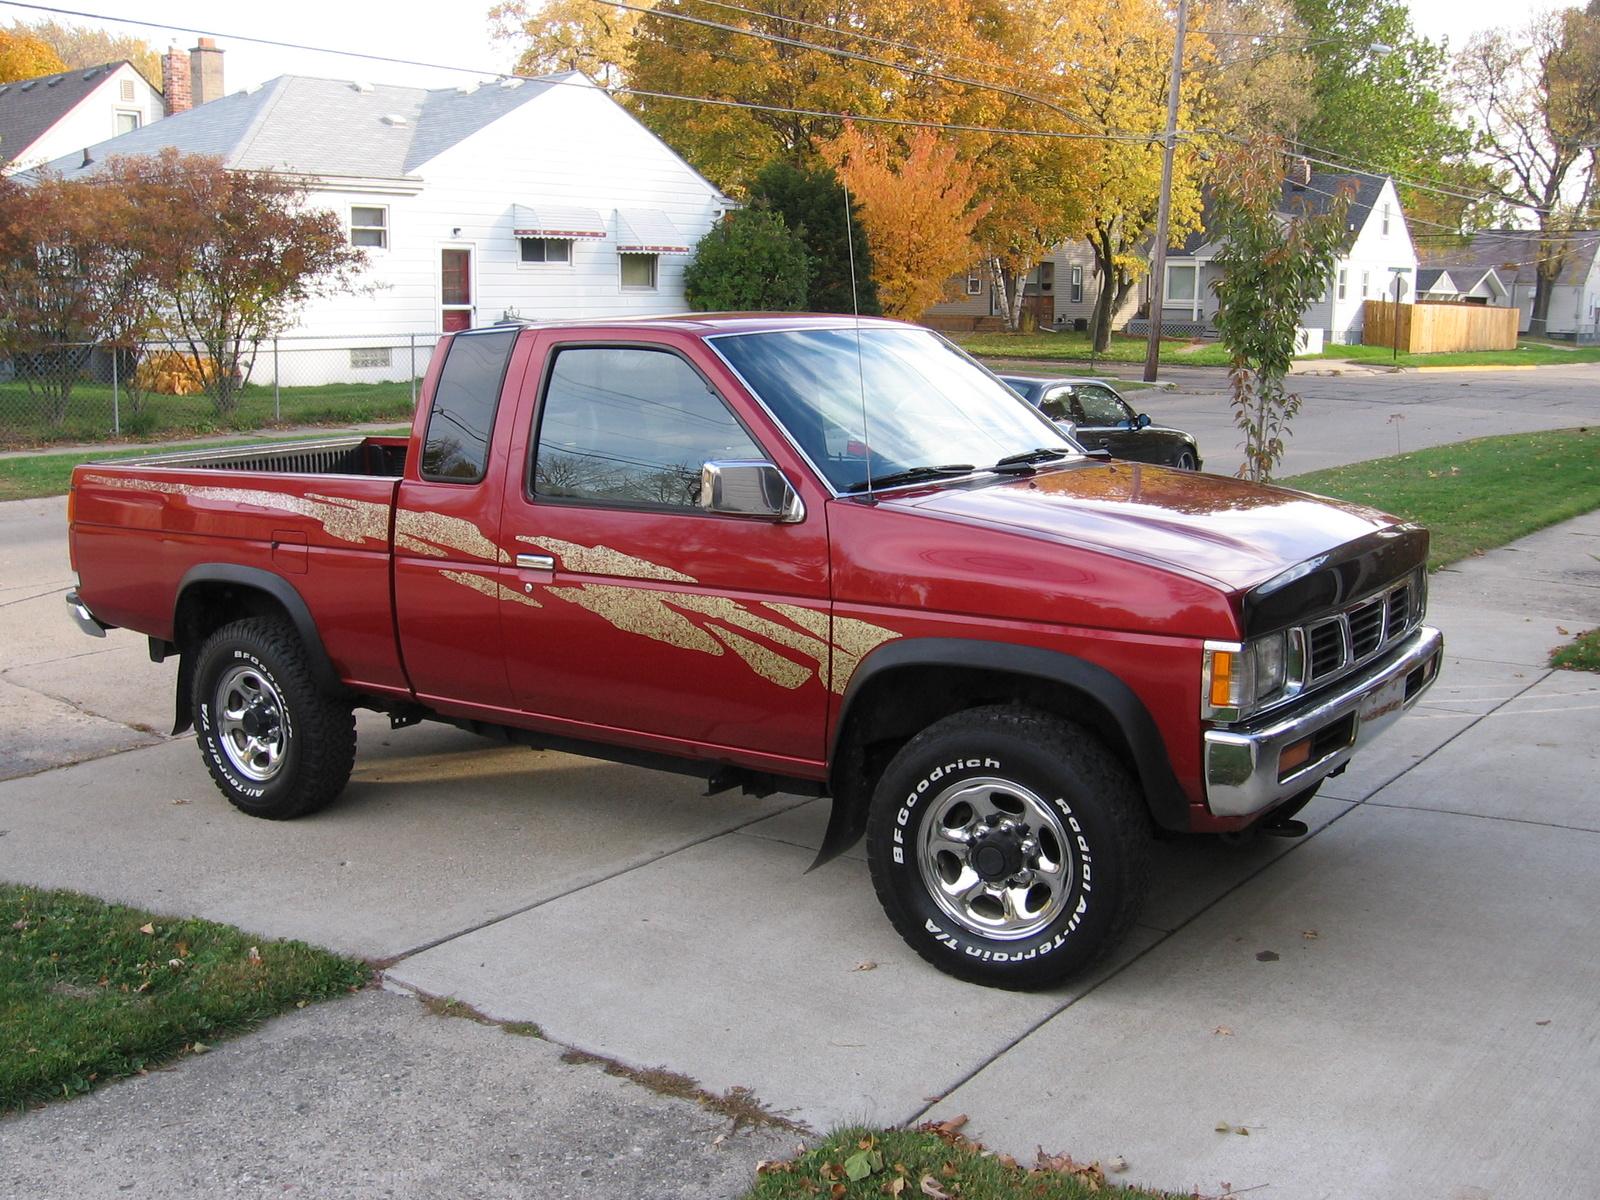 modification auto pickup nissan original ride photos up nates pick info specs